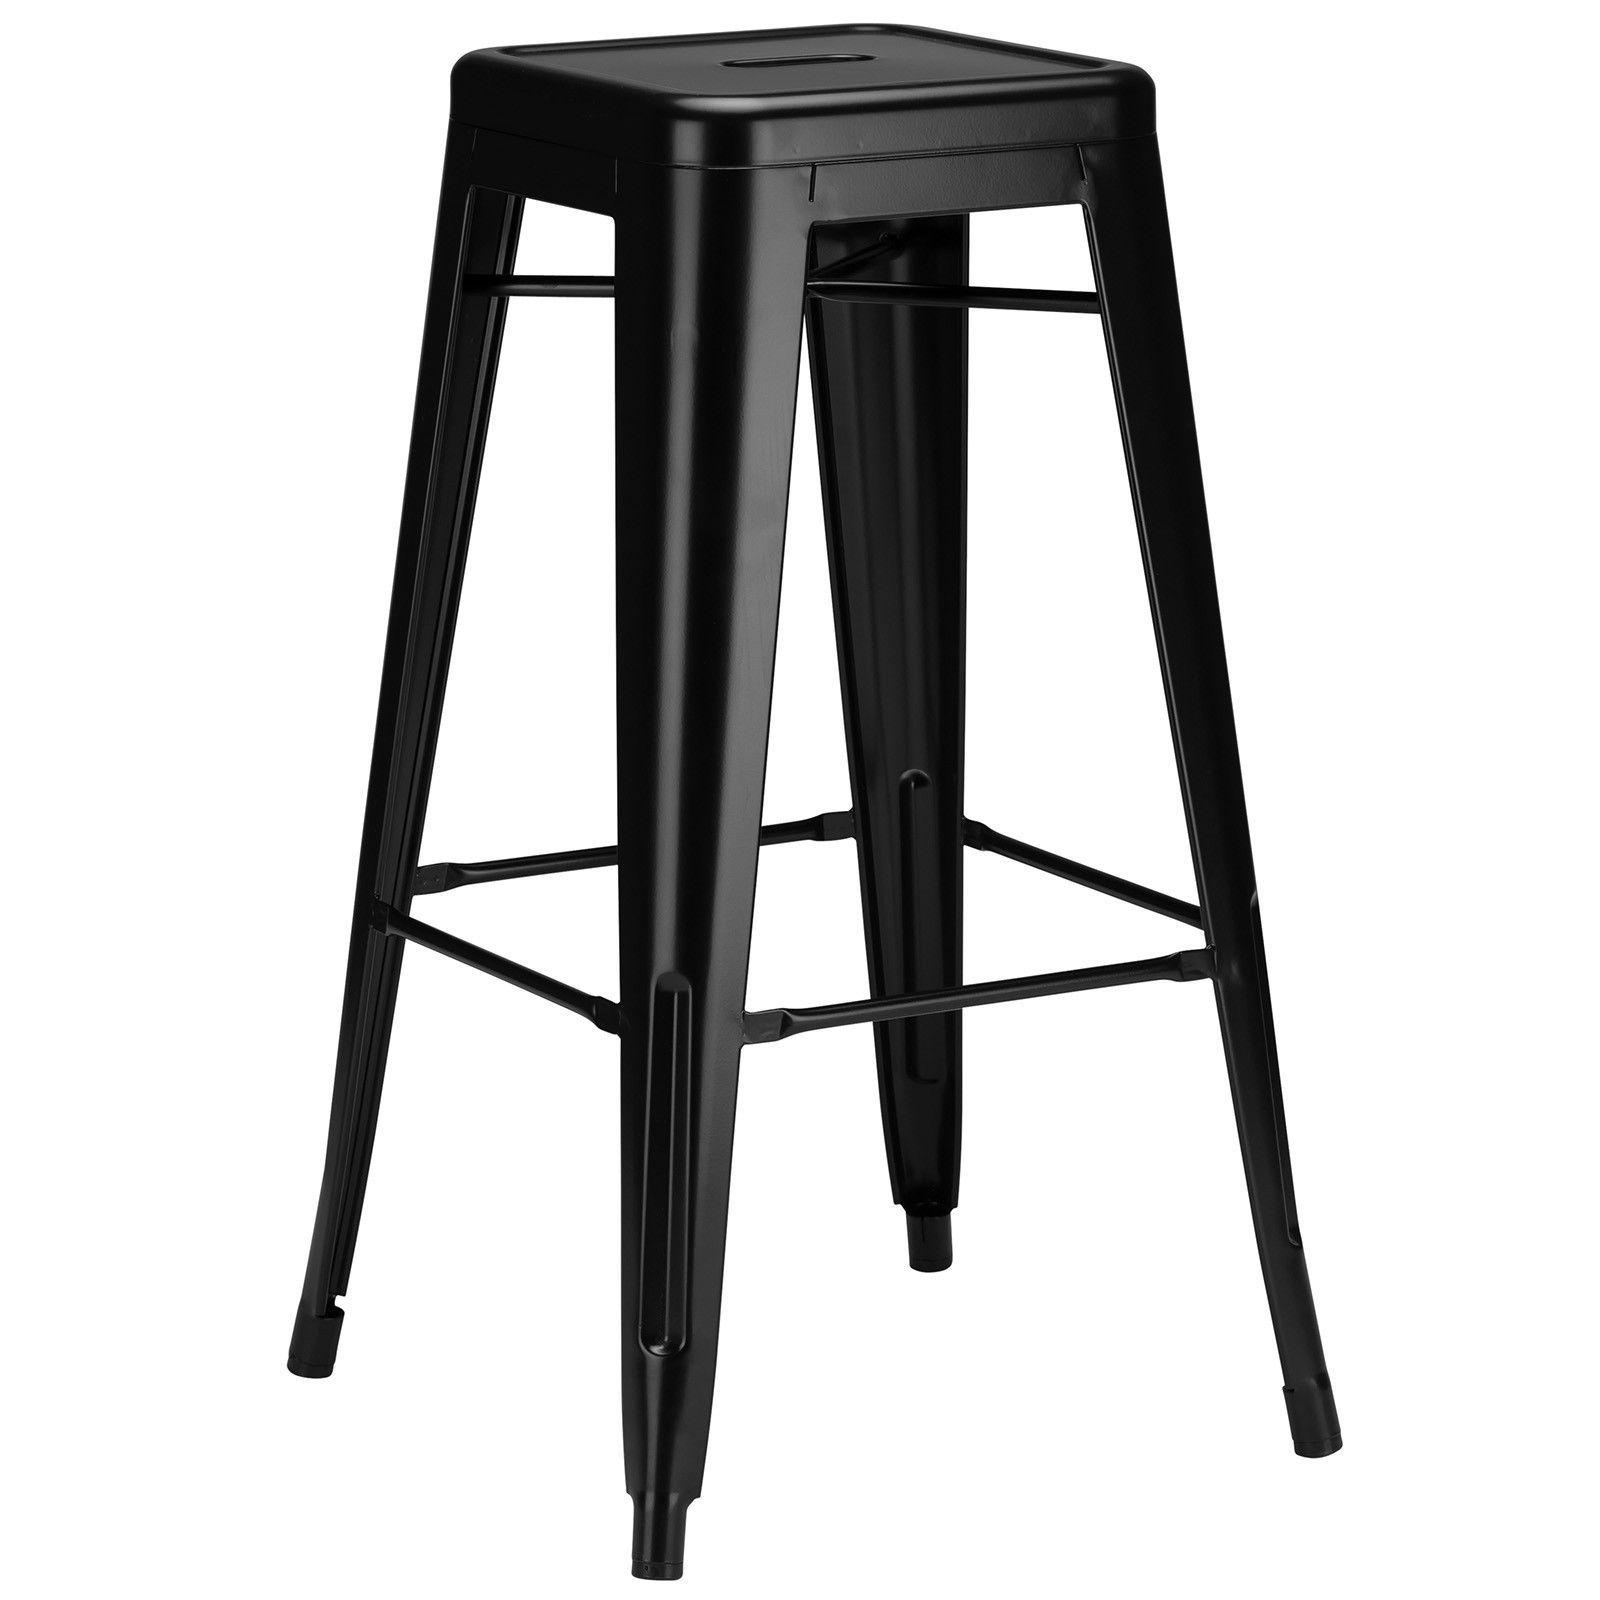 Lanna Furniture Trattoria Bar Stool | Outdoor Kitchen | Pinterest ...